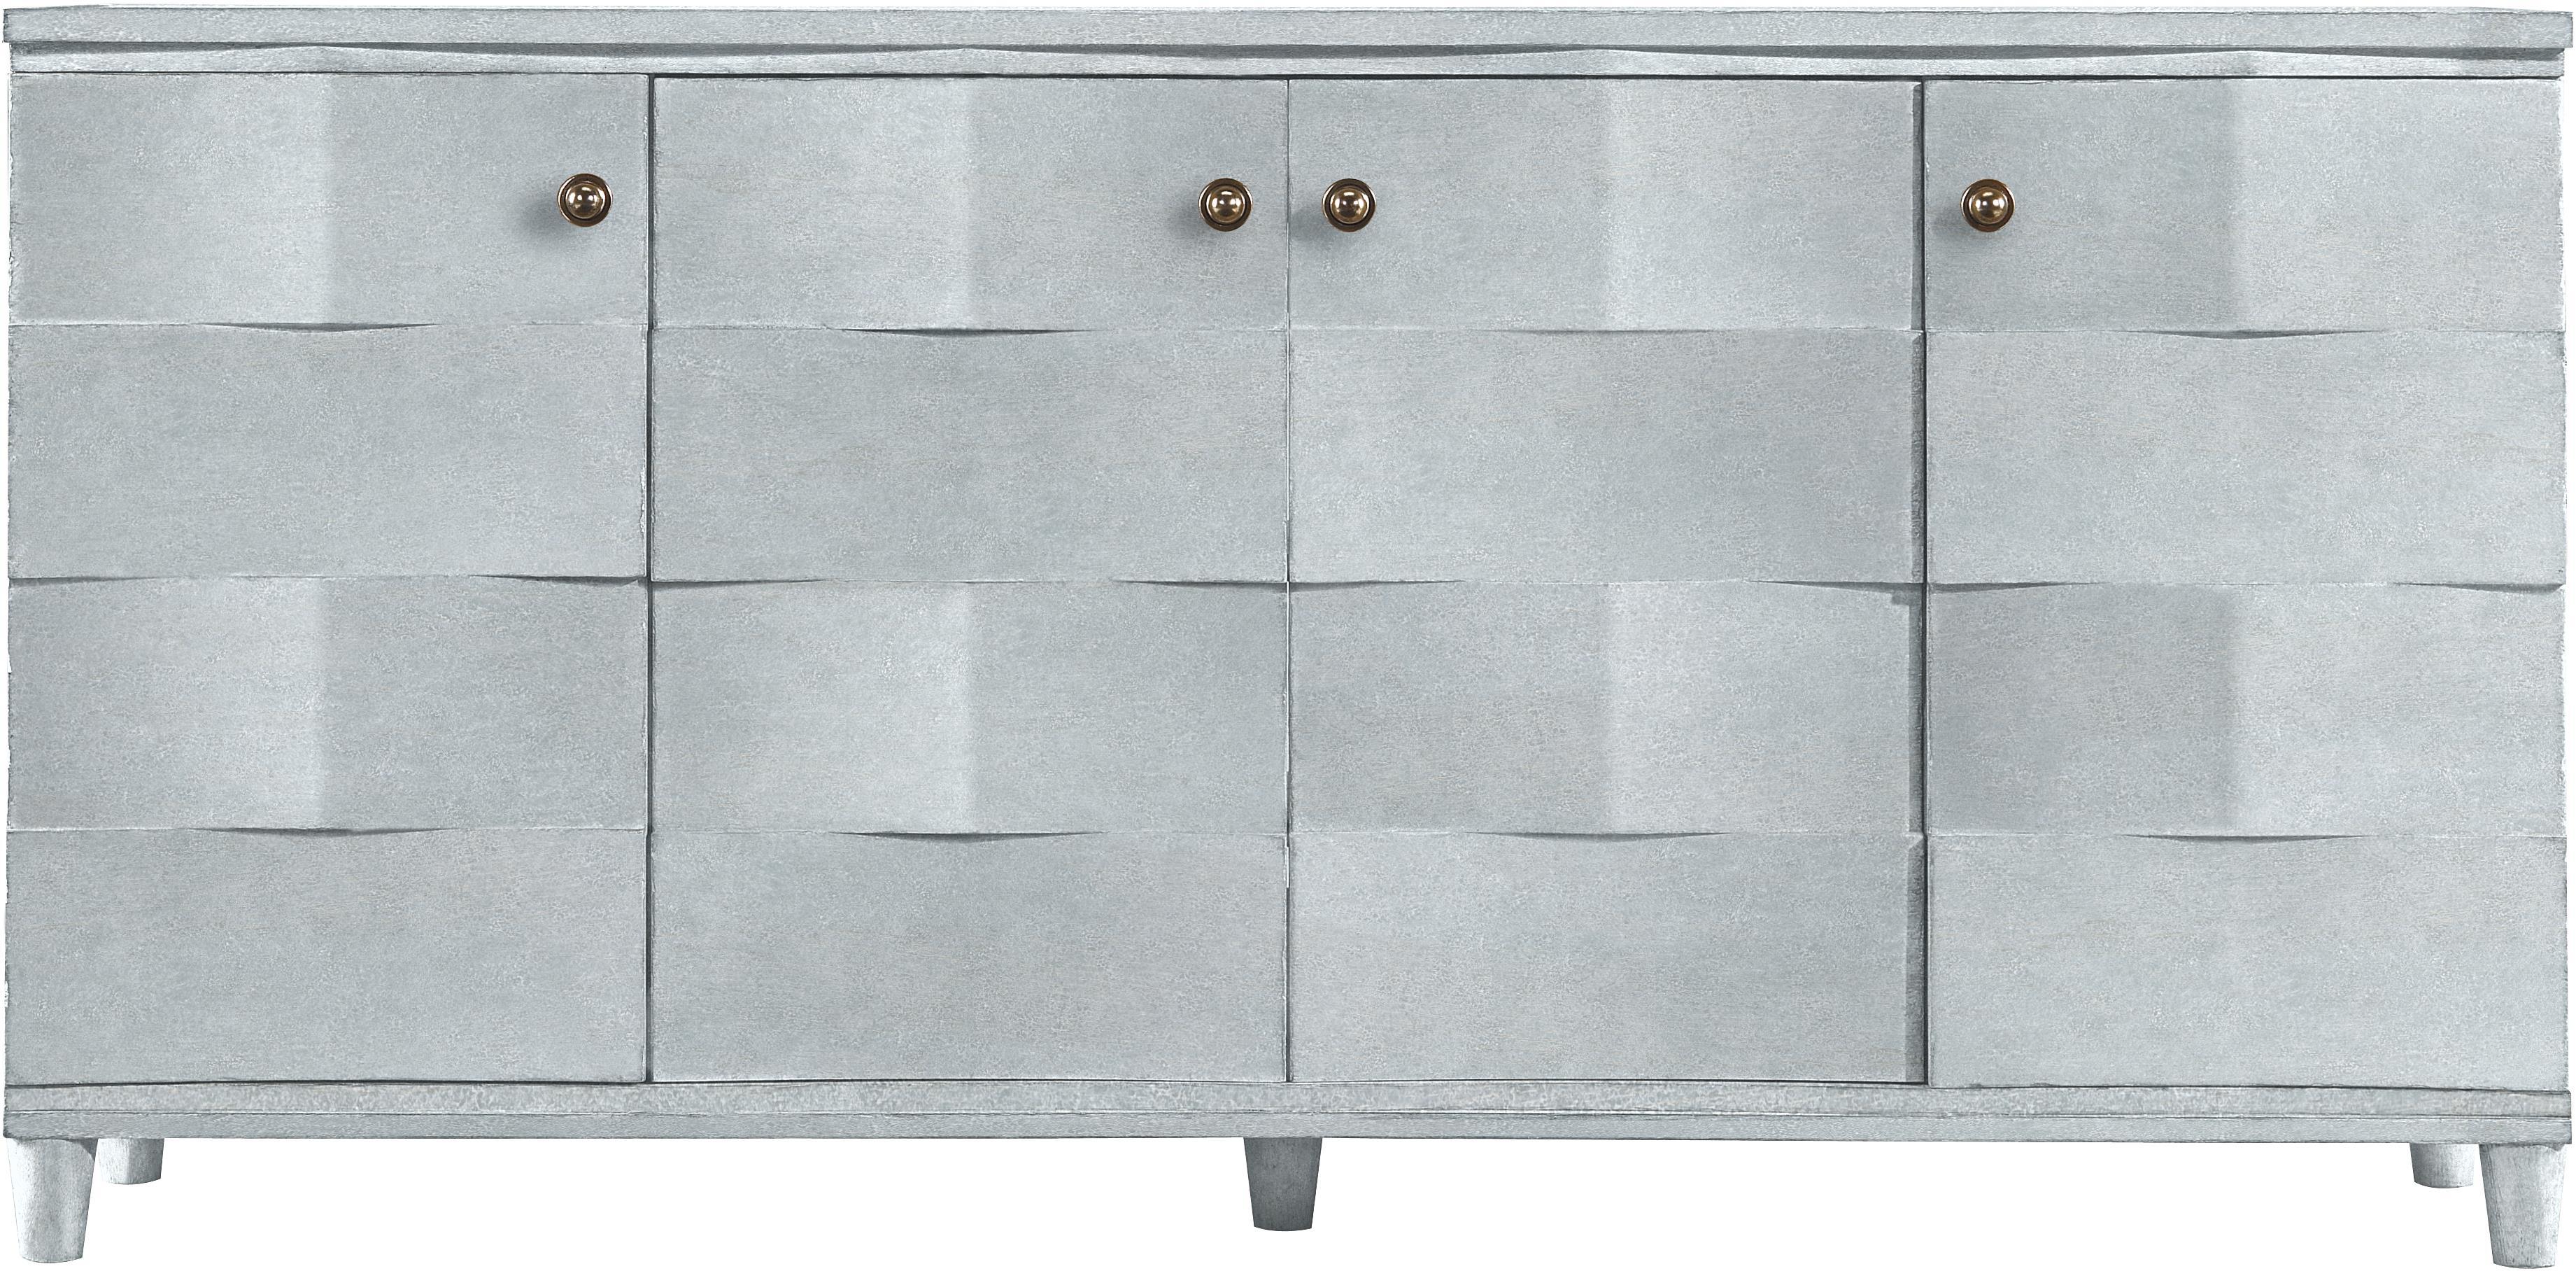 Stanley Furniture Coastal Living Resort Ocean Breakers Console - Item Number: 062-H5-31